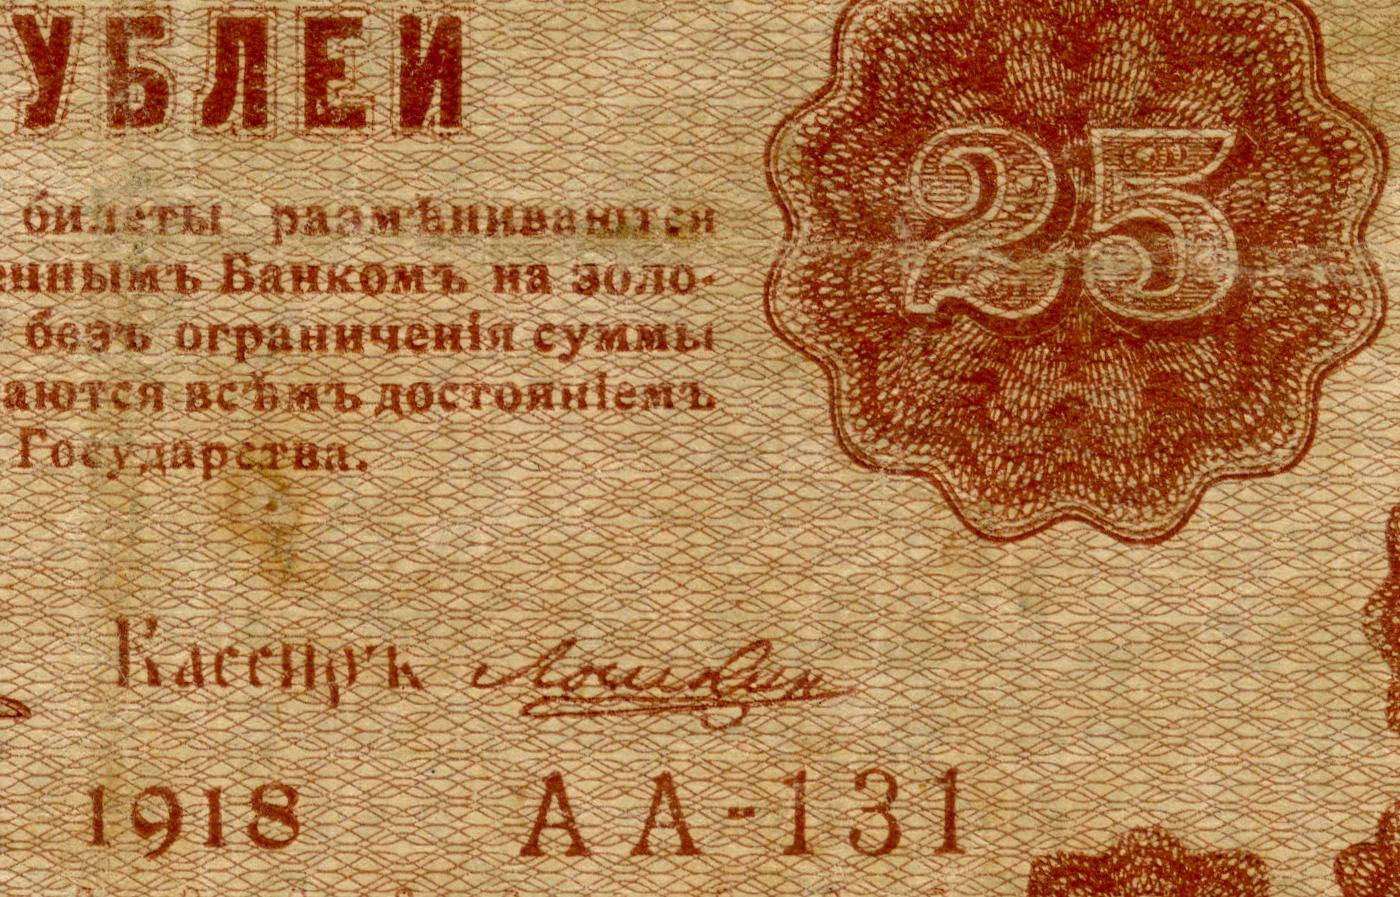 Банкнота 25 рублей 1918. Кассир Лошкин (серия АА-131). VF